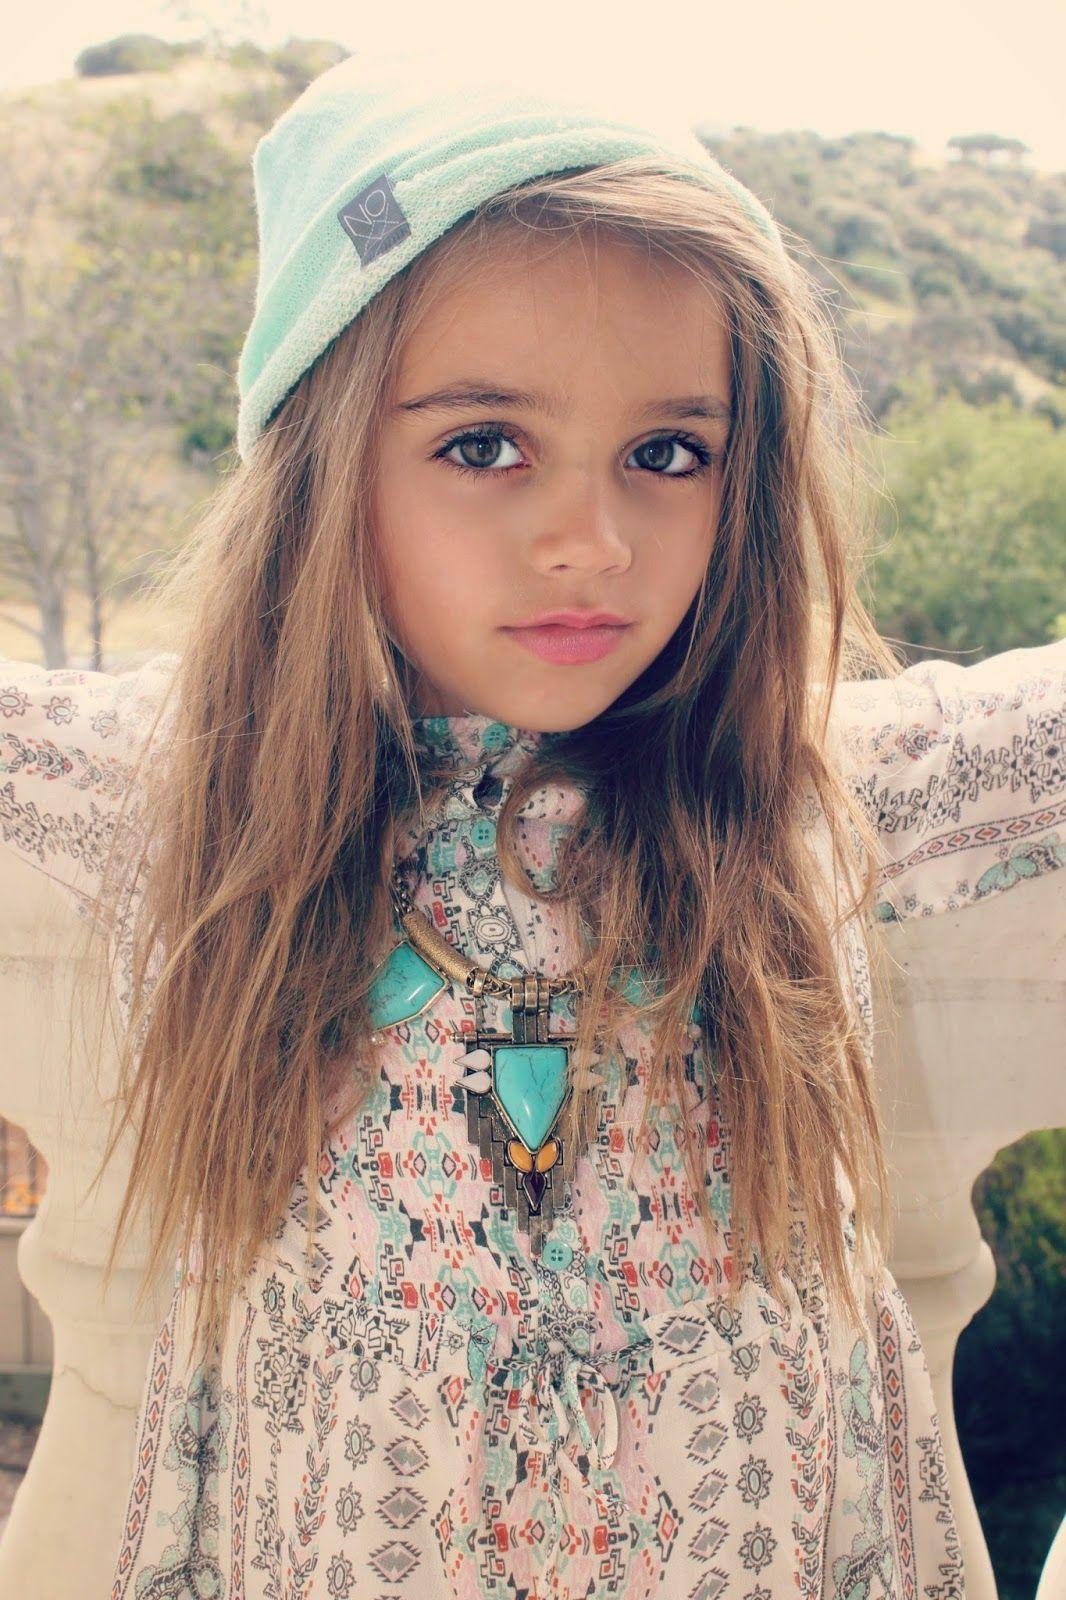 Cute Kids: NOXXaz Handcrafted Goods Summer